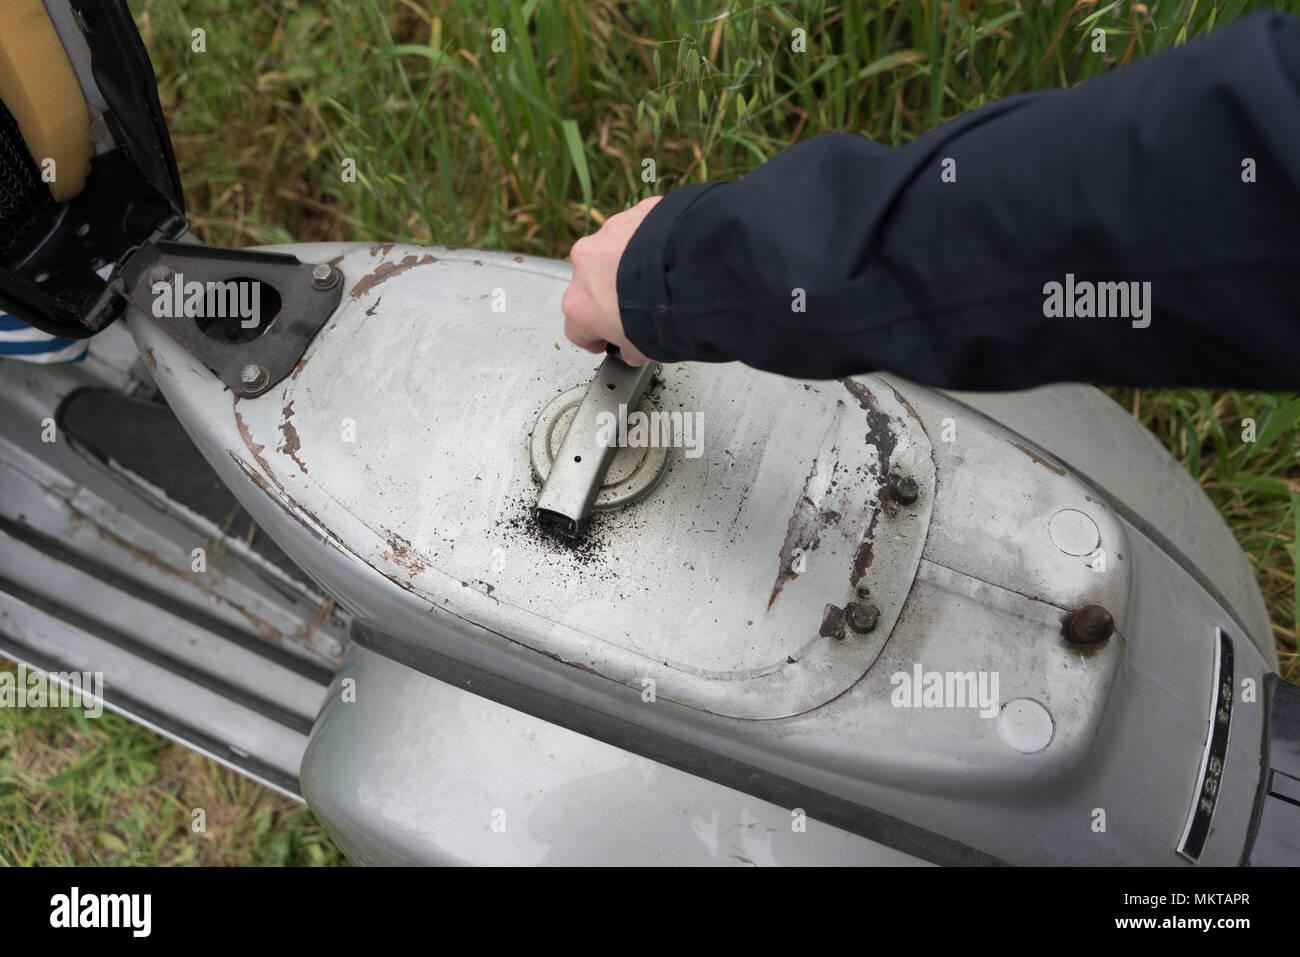 1974 Vespa 125 TS / Rally fuel tank - Stock Image